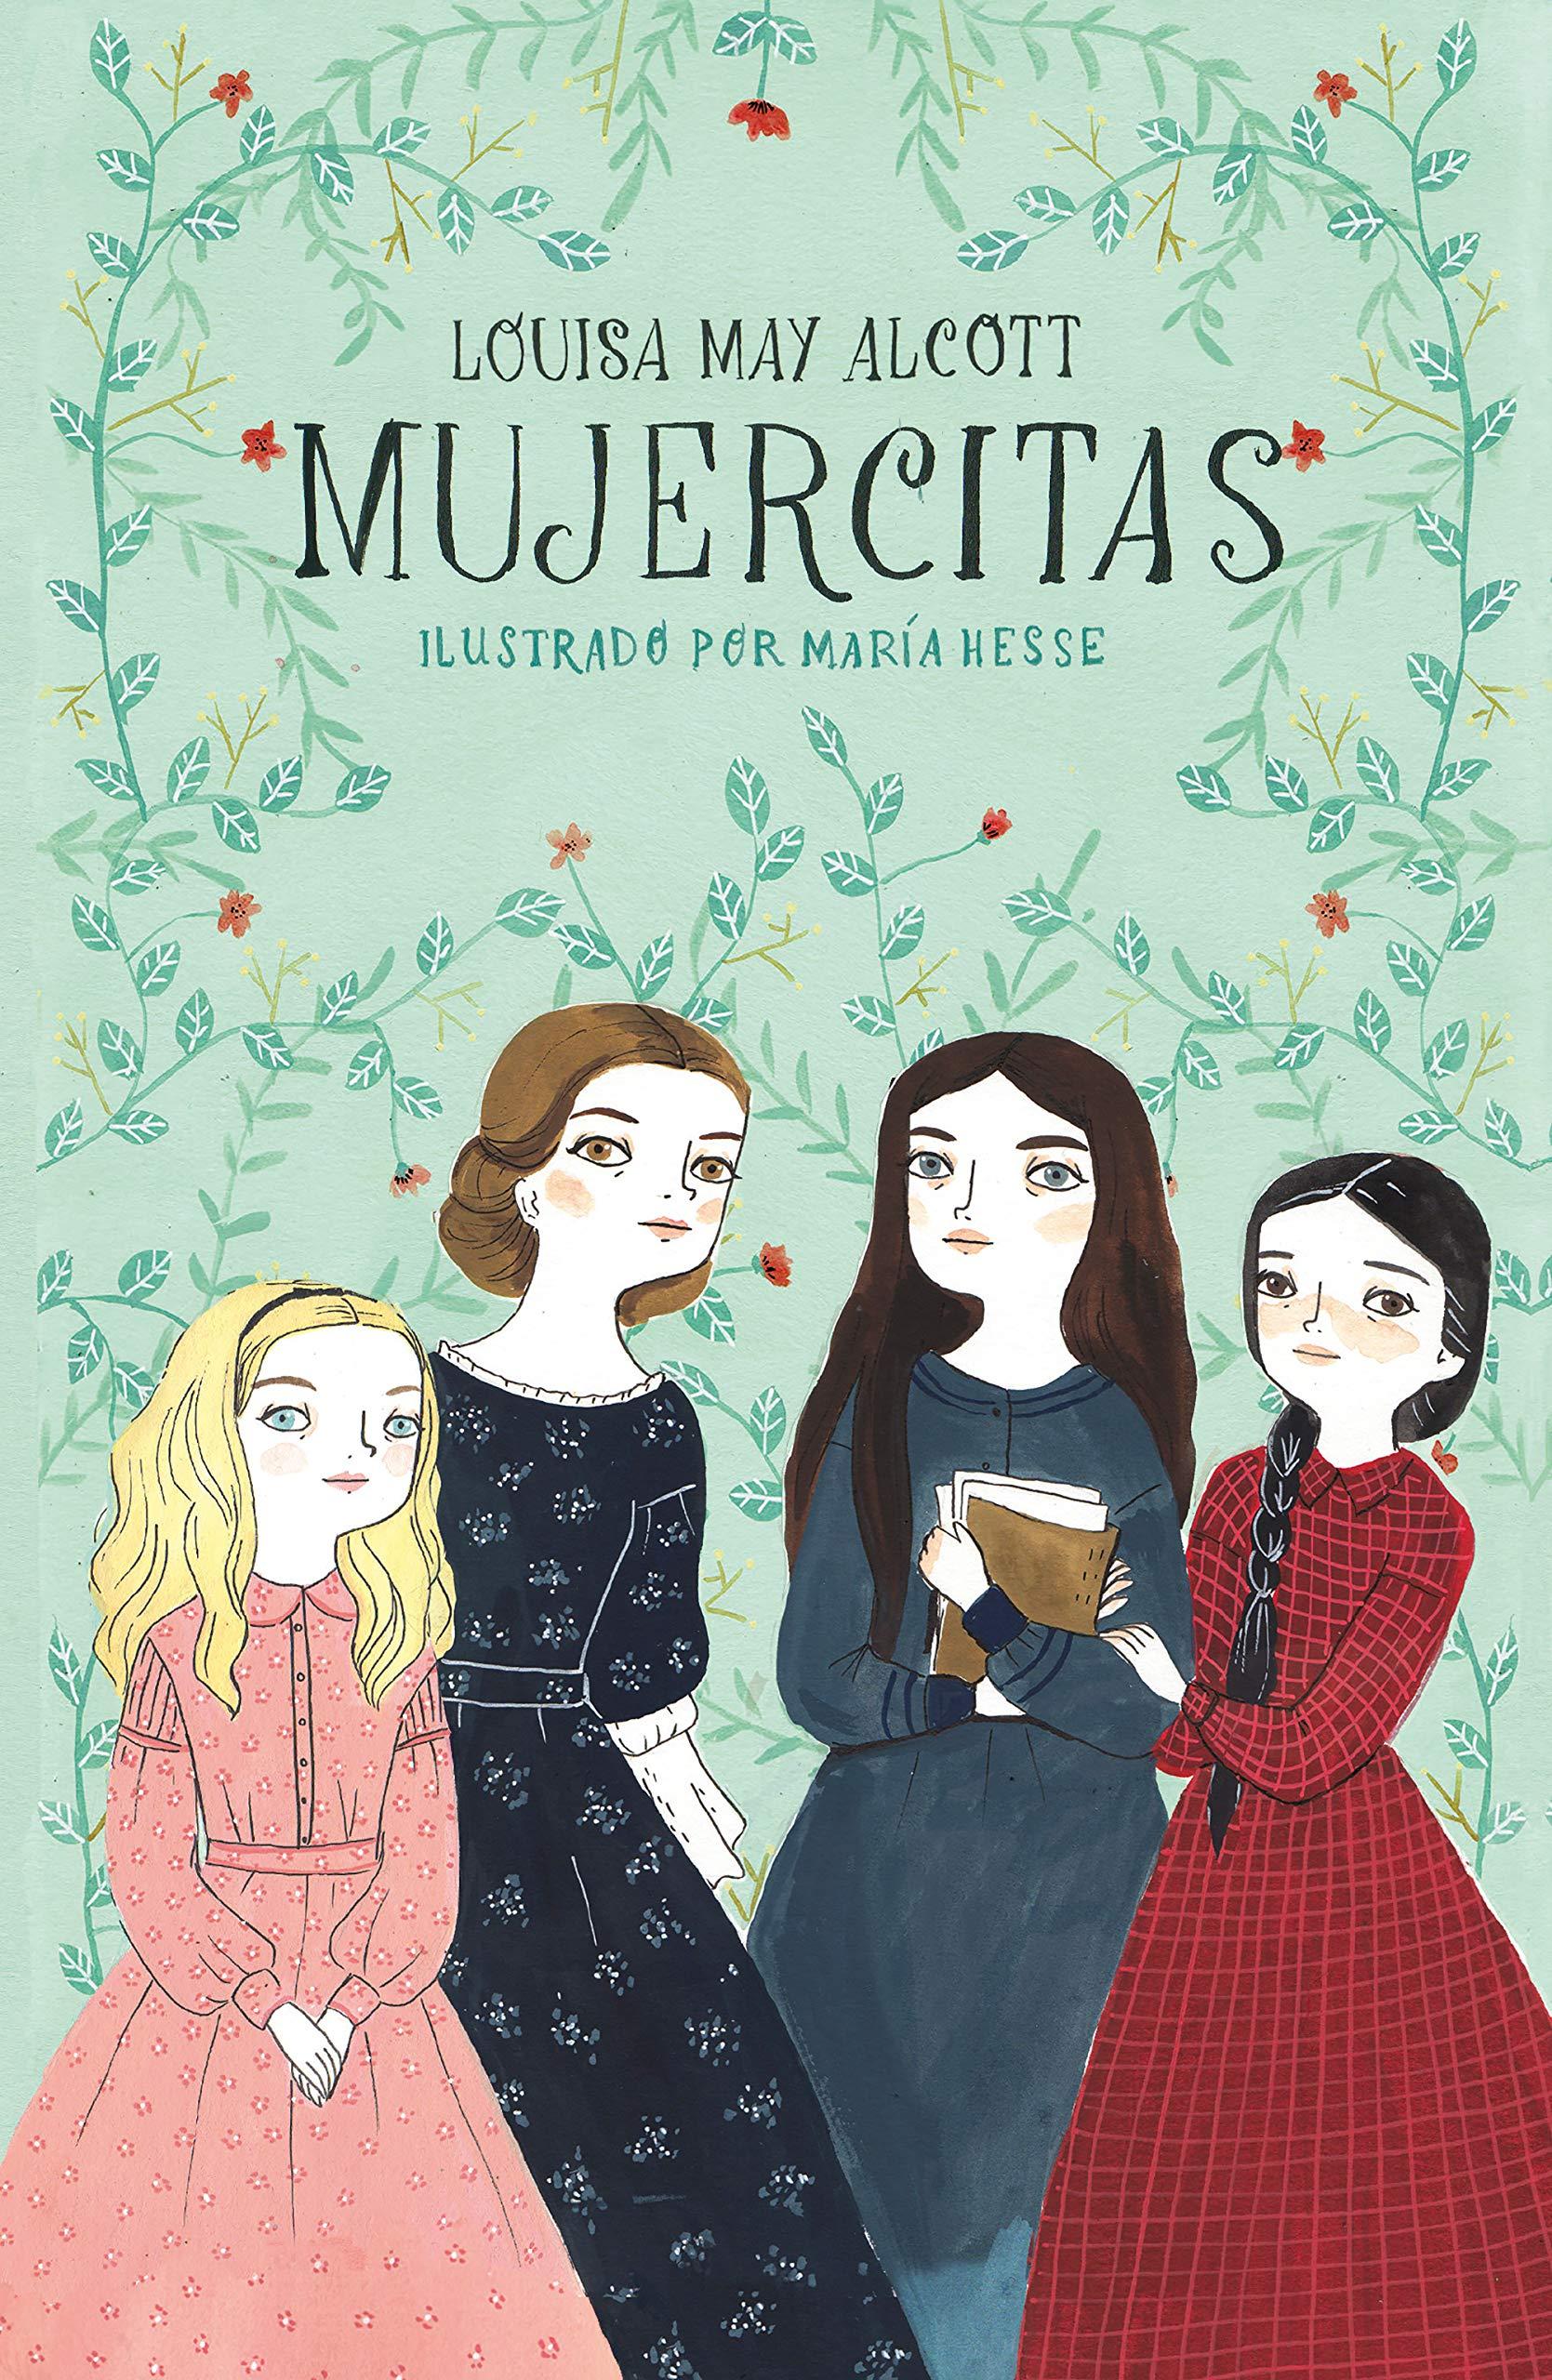 Mujercitas Colección Alfaguara Clásicos Spanish Edition Alcott Louisa May Hesse María 9788420433592 Books